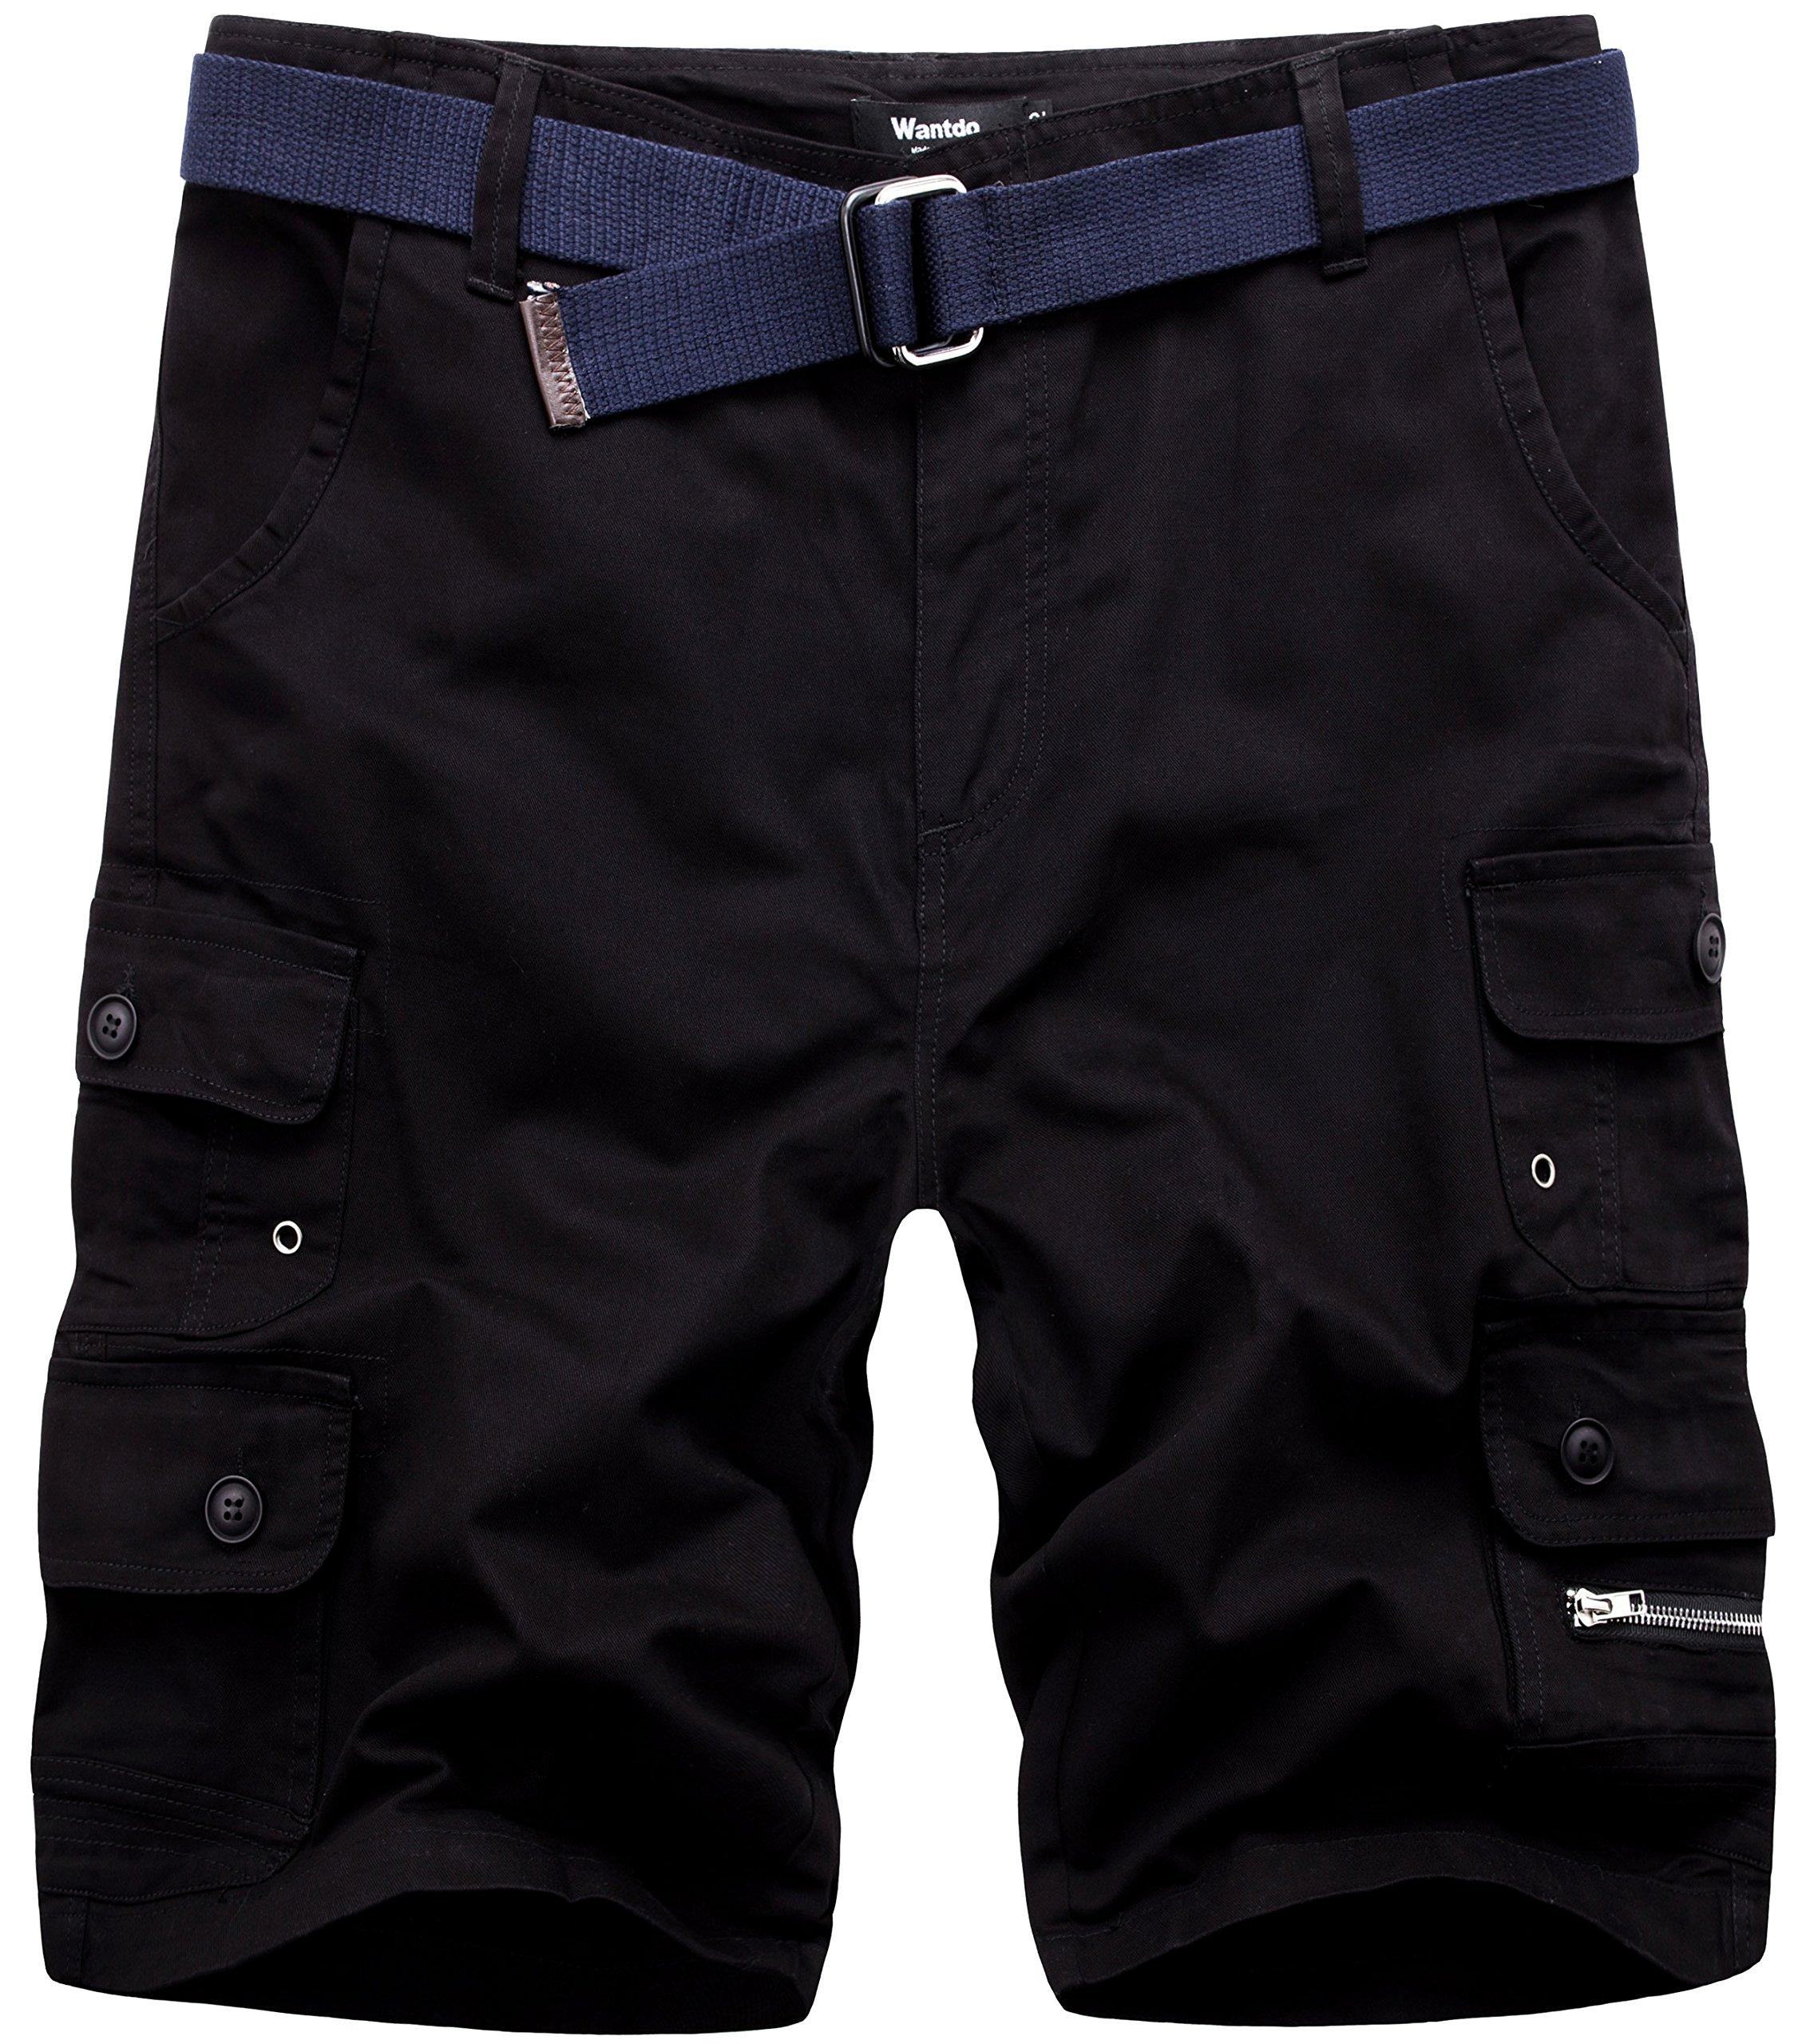 Wantdo Men's Belted Cotton Cargo Shorts 38 Black